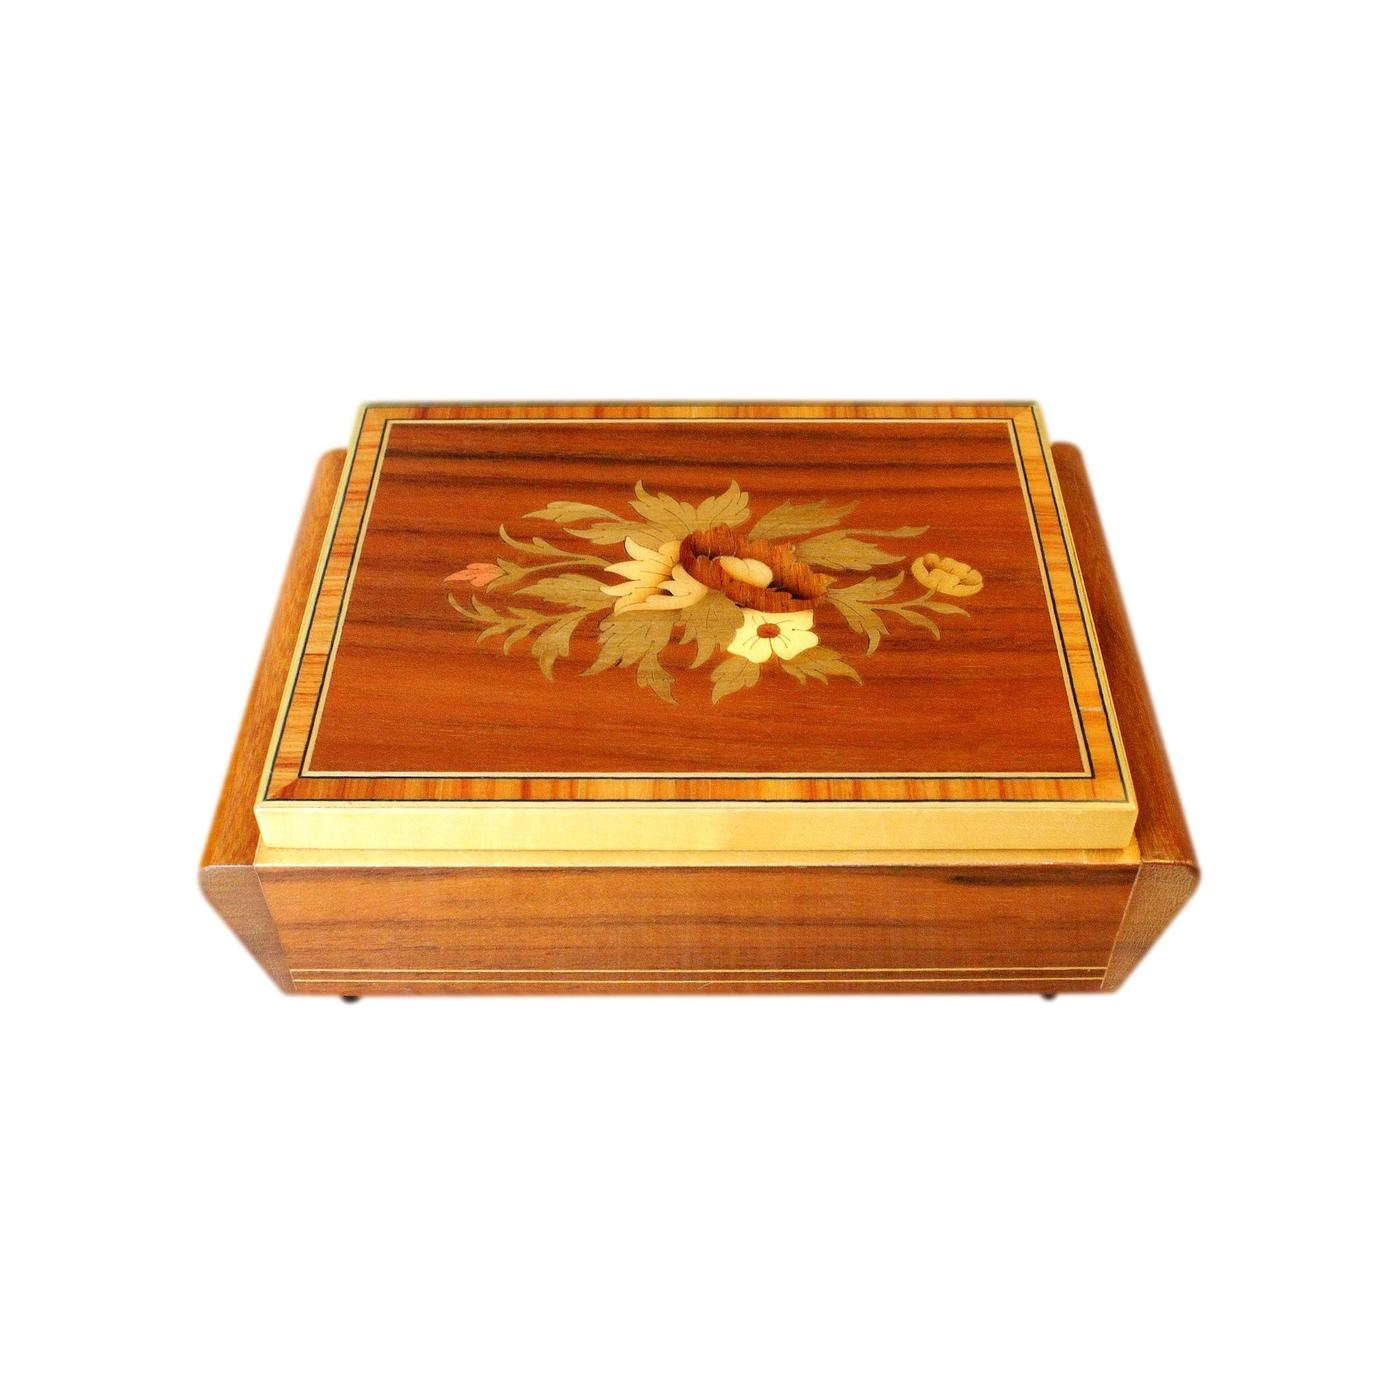 Beautiful Italian Marquetry Inlaid Vintage Musical Jewellery Box